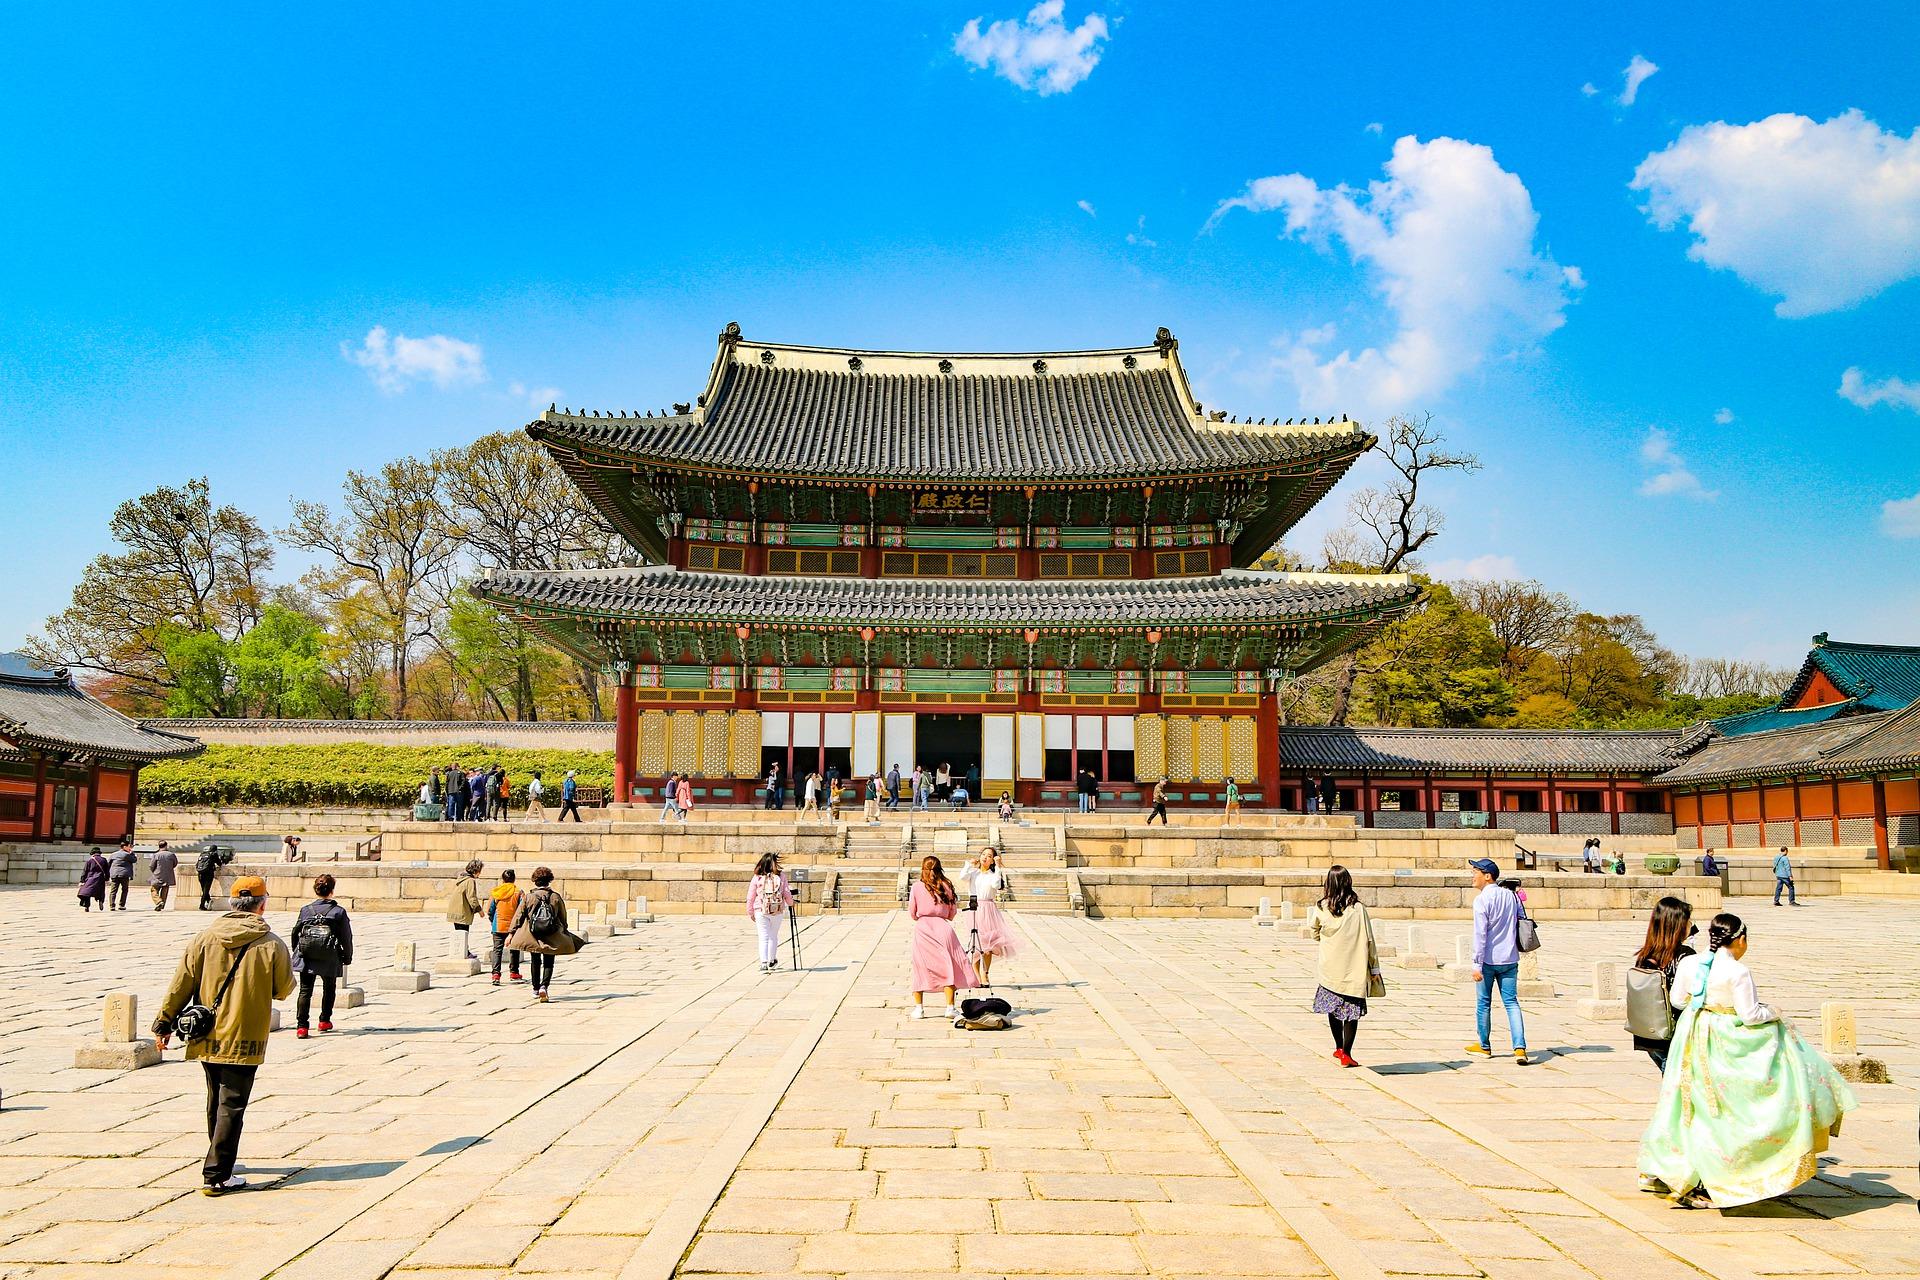 Південна Корея Сеул Чхандоккун